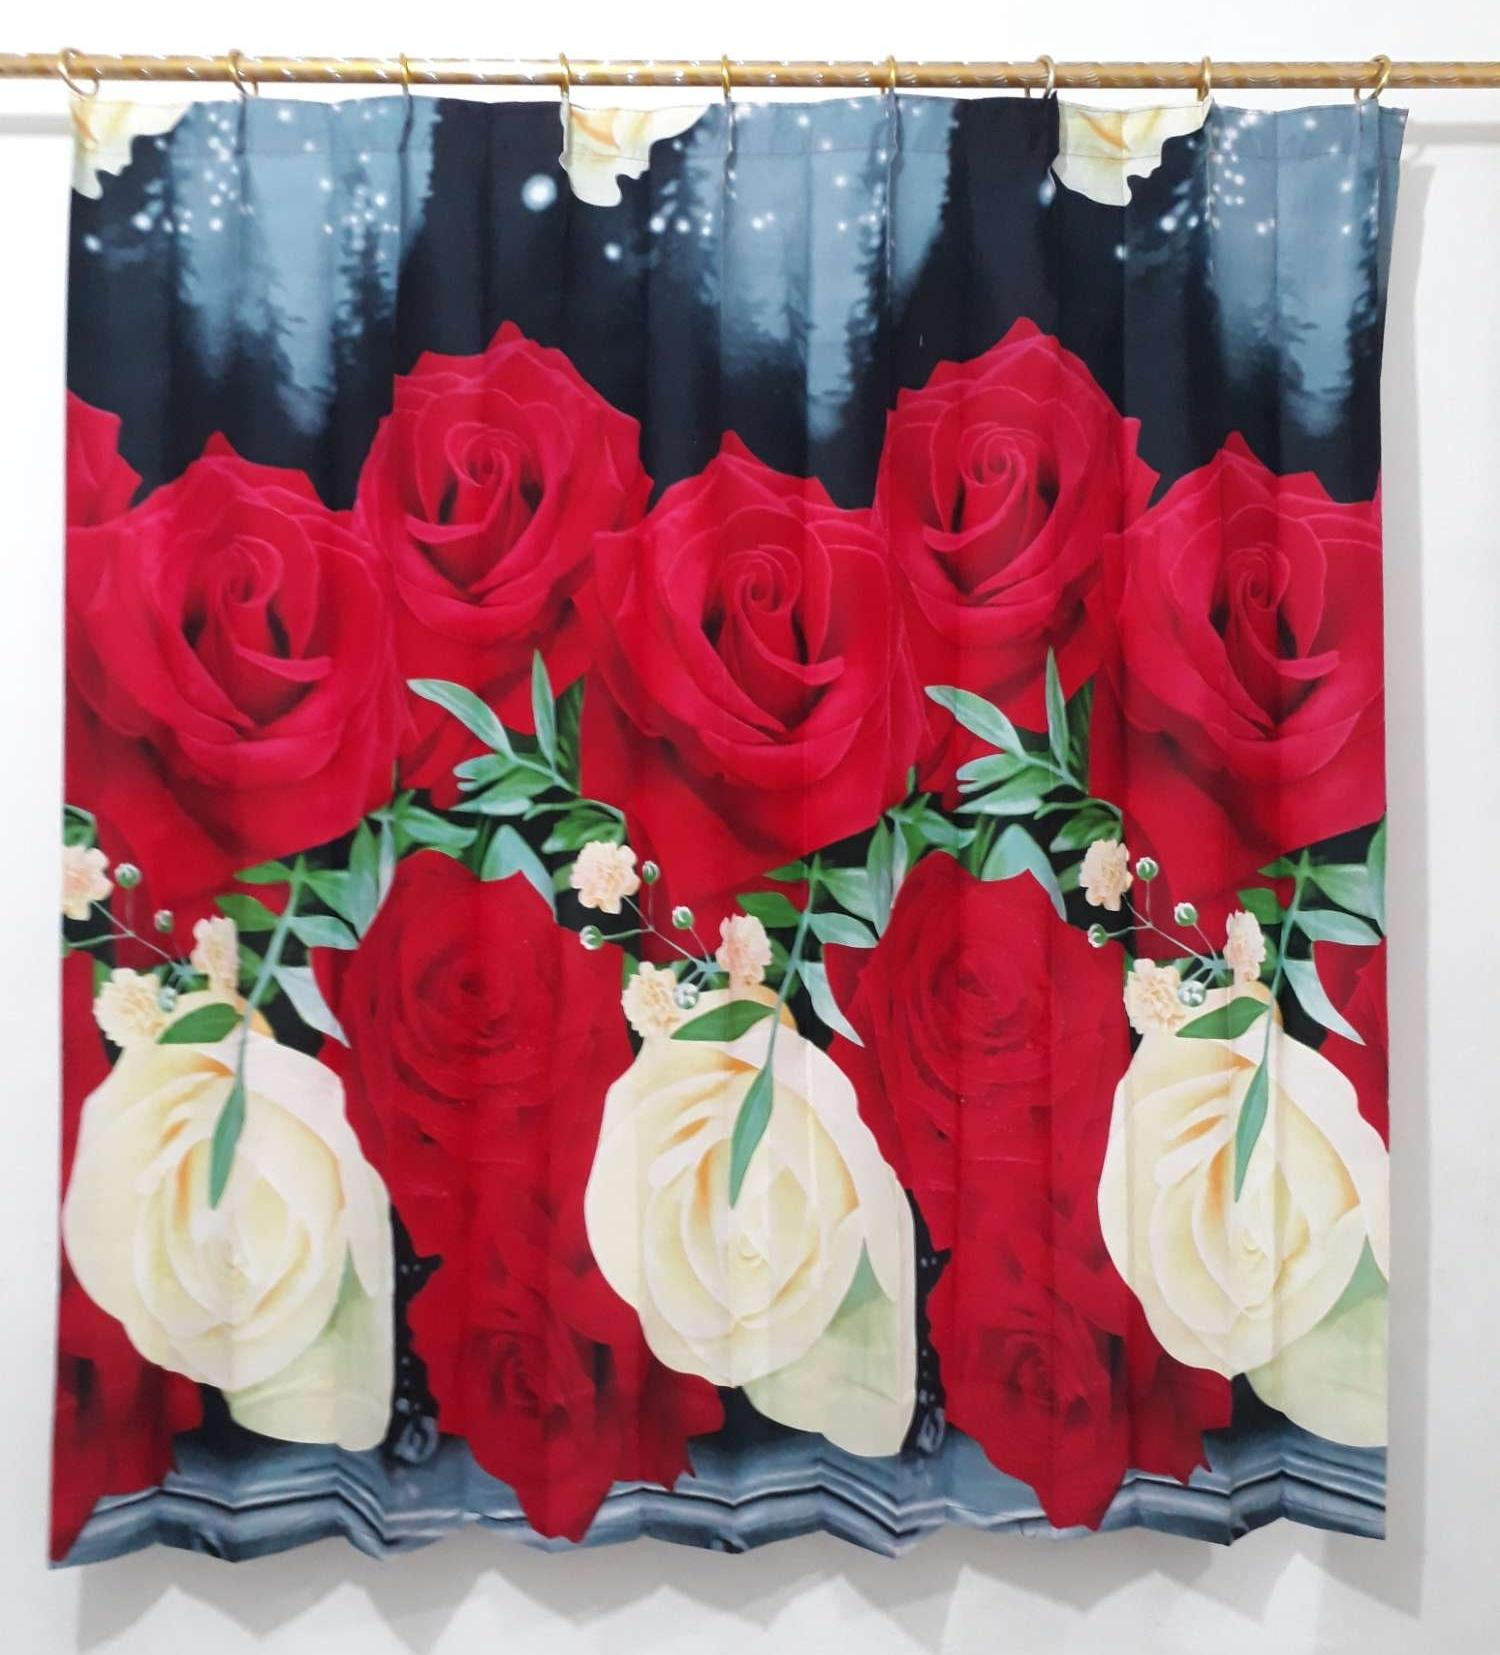 Mawar88shop Tirai Benang Motif Love Satu Warna Daftar Harga Source · Tirai Benang Motif Love Isi Source Gorden hordeng jendela tanggung 2 kaca Mawar Merah ...